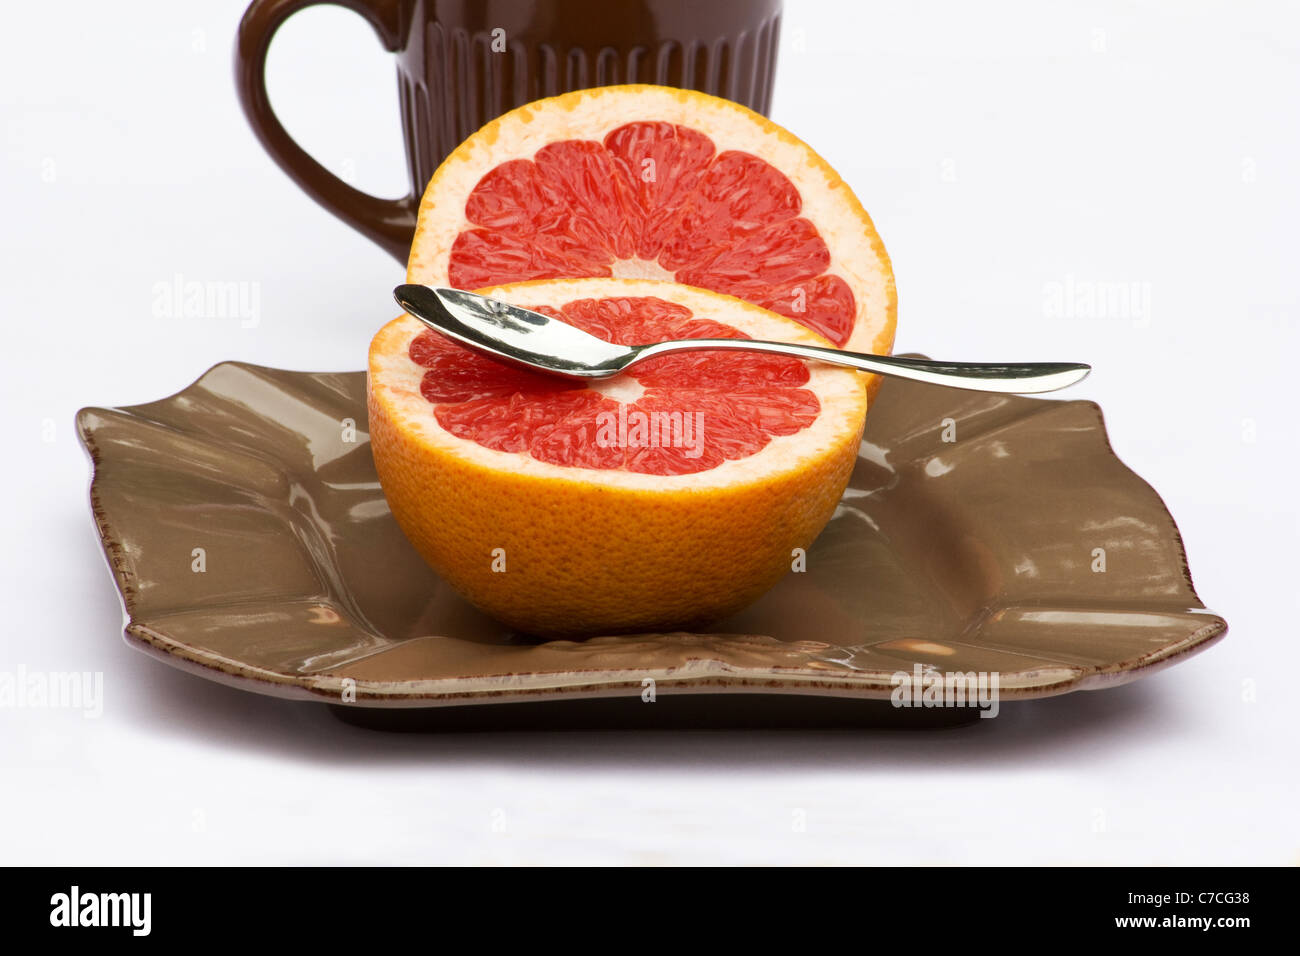 Fresh ruby grapefruit cut in halves on white background - Stock Image